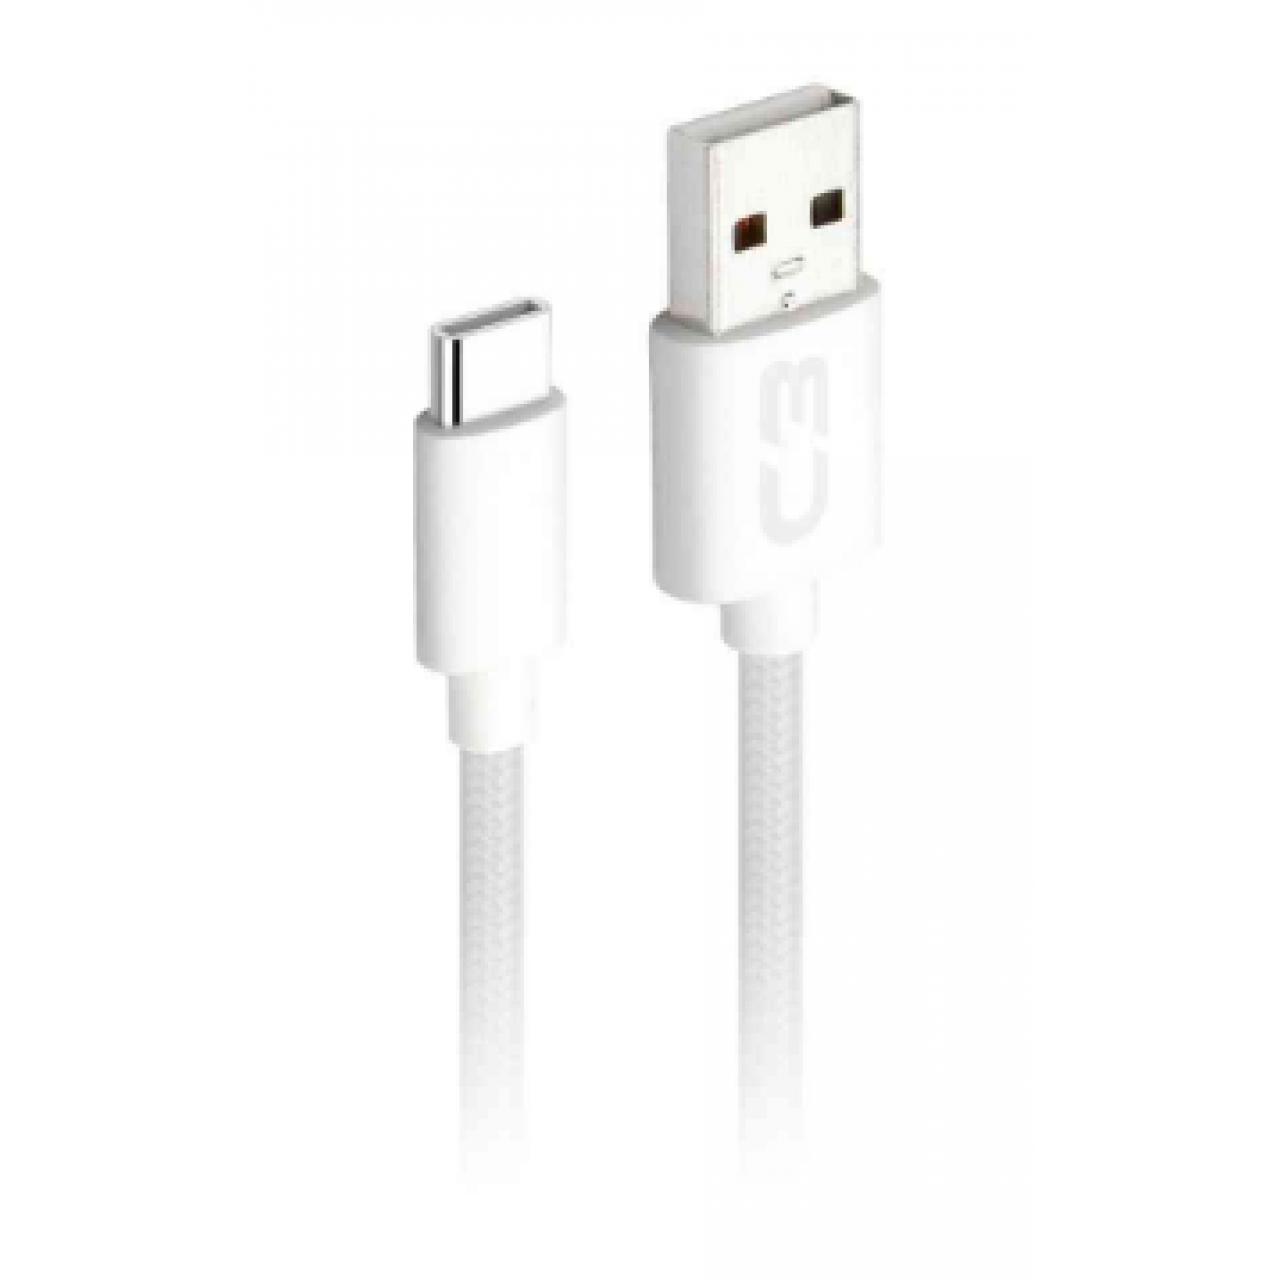 CABO TIPO C USB 2.0 AM 2m BRANCO CB-C21WHX C3 PLUS@